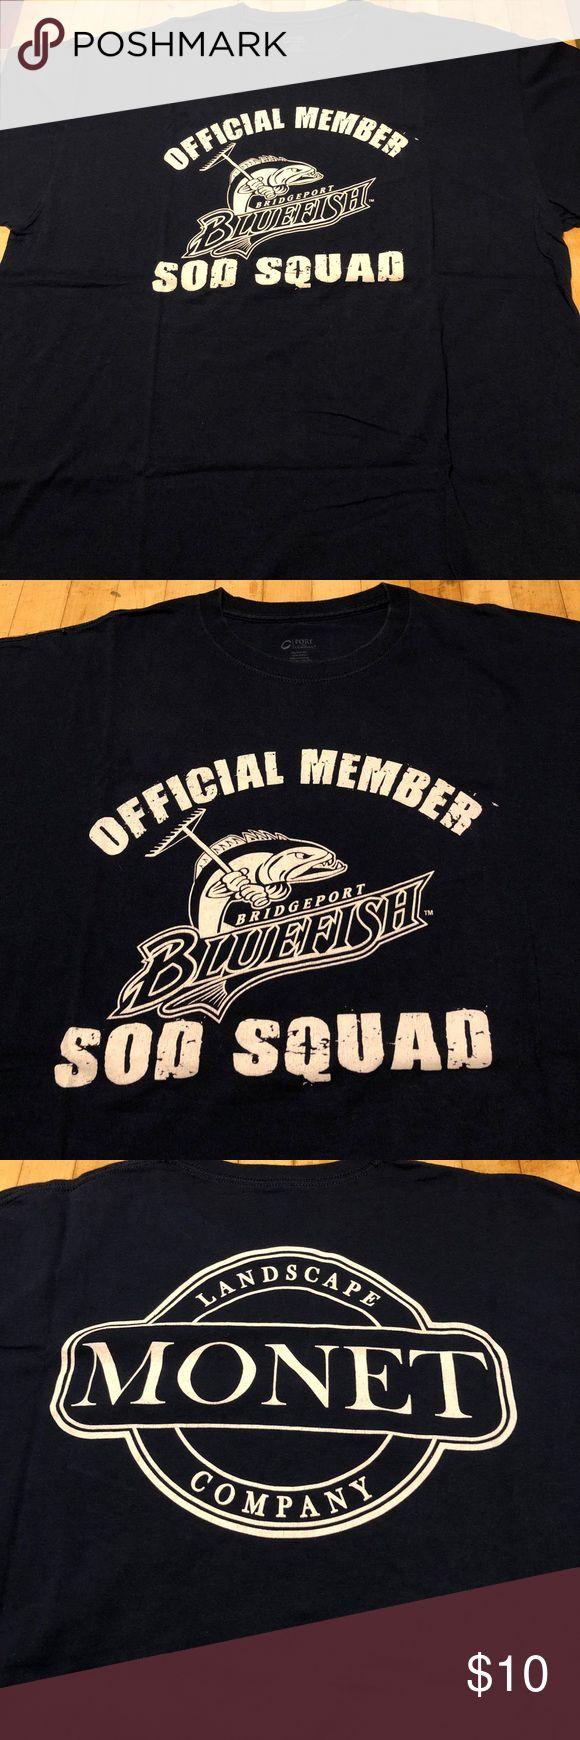 Bridgeport Bluefish Sod Squad T-shirt Bridgeport Bluefish Sod Squad T-shirt Shirts Tees - Short Sleeve